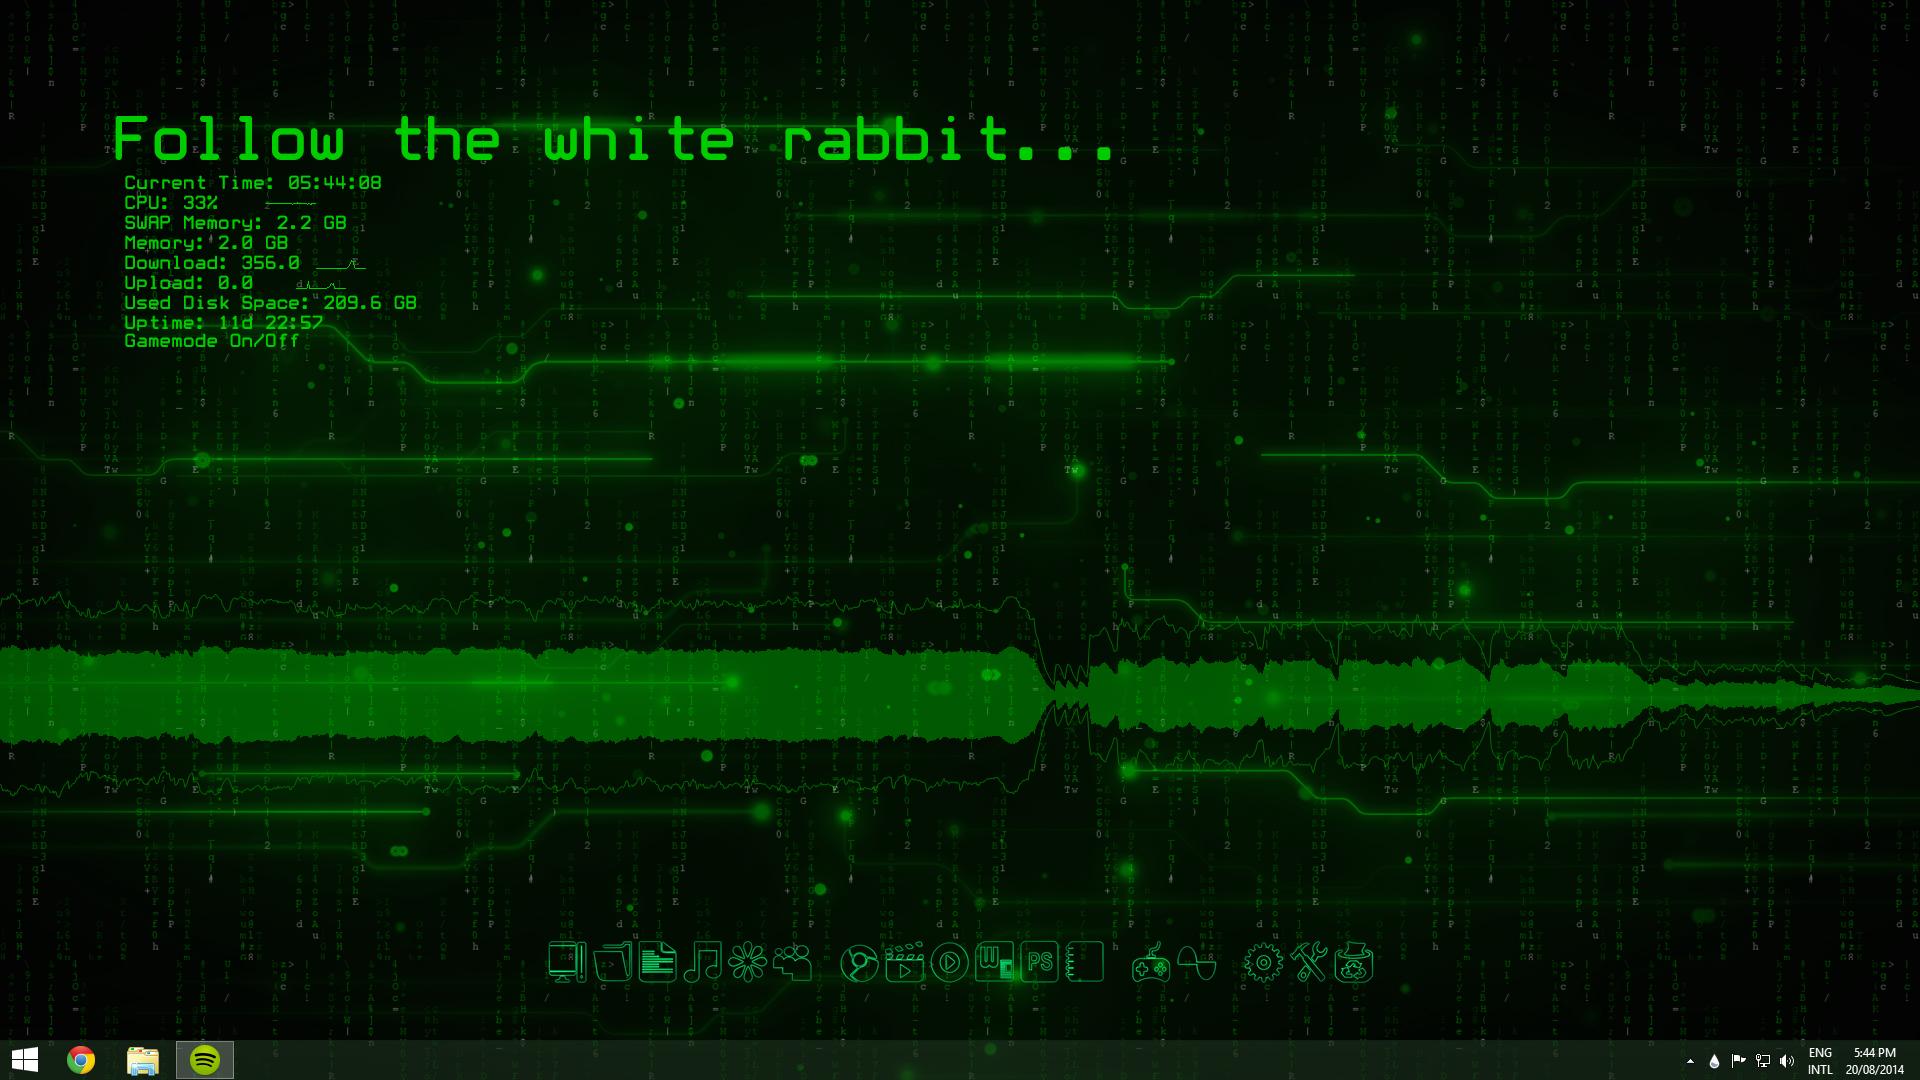 animated matrix desktop by leoflare on deviantart